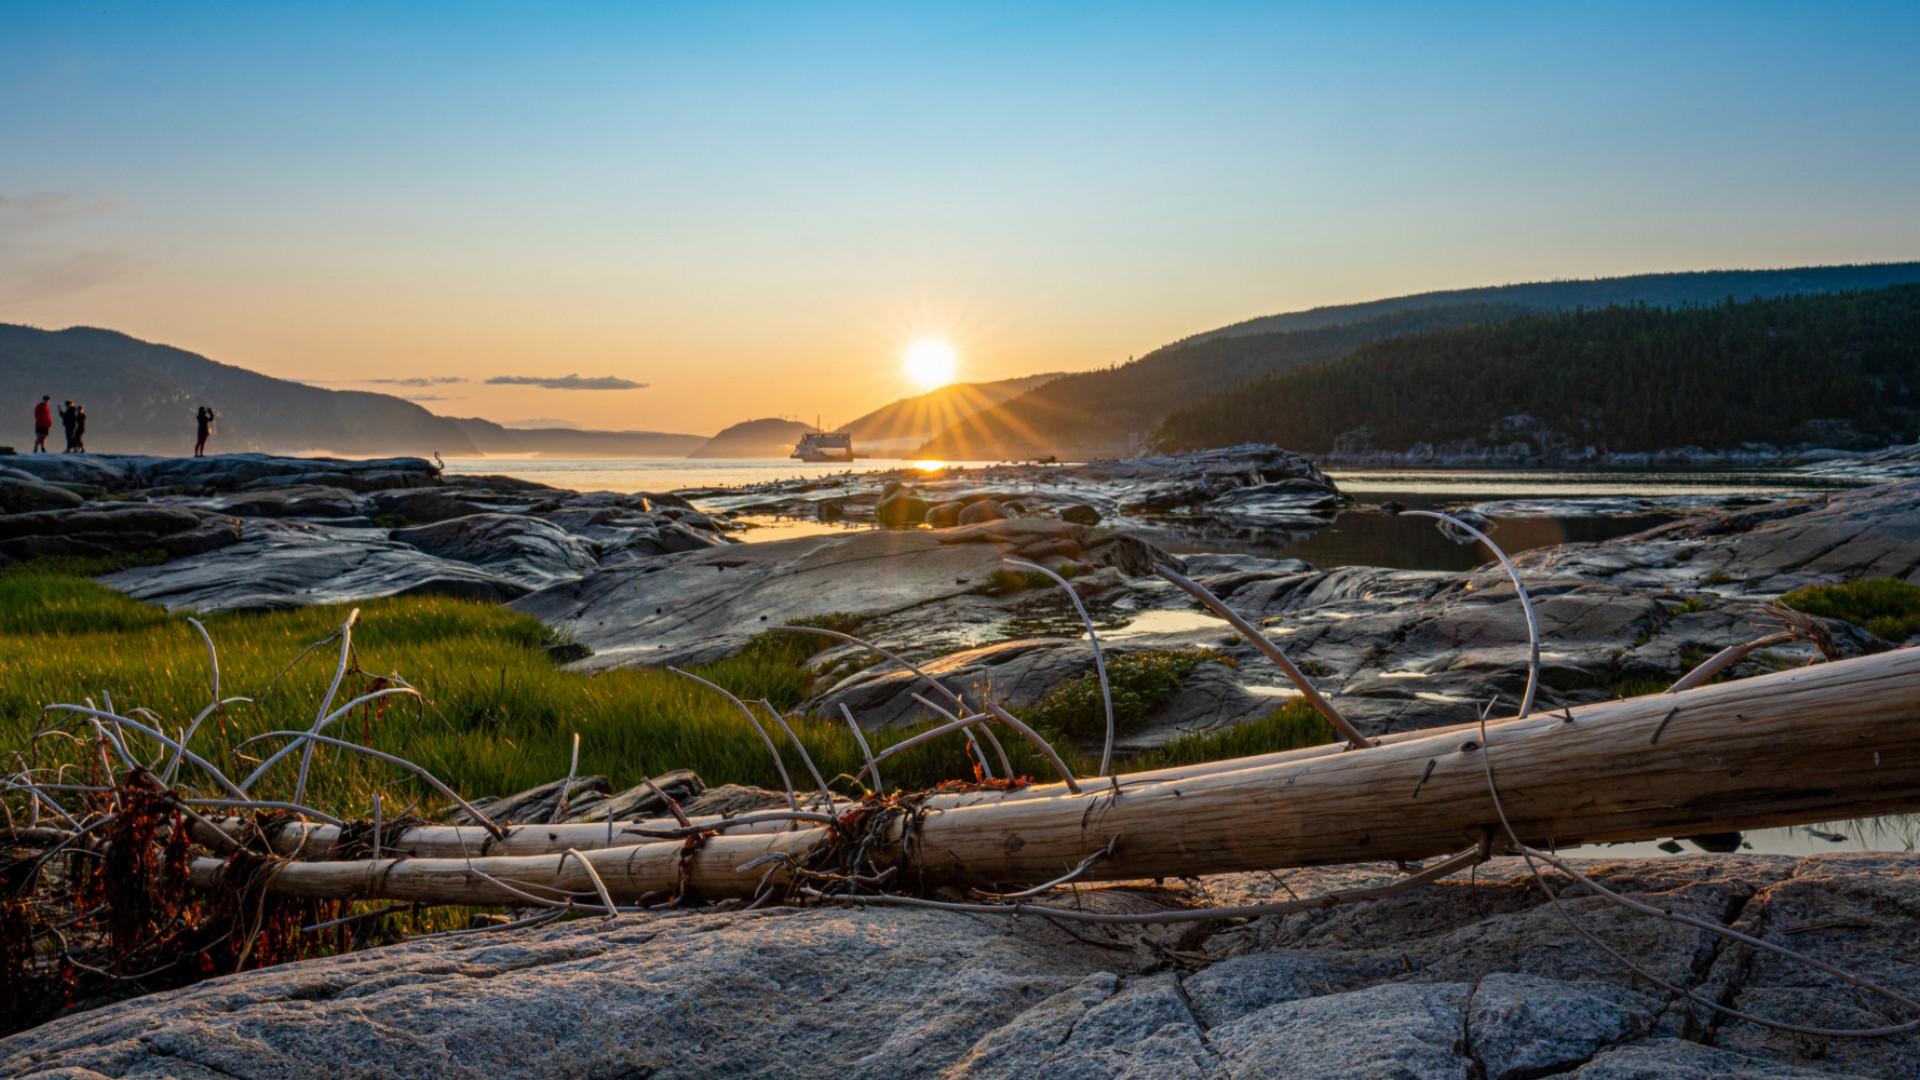 sunset on fjord in quebec